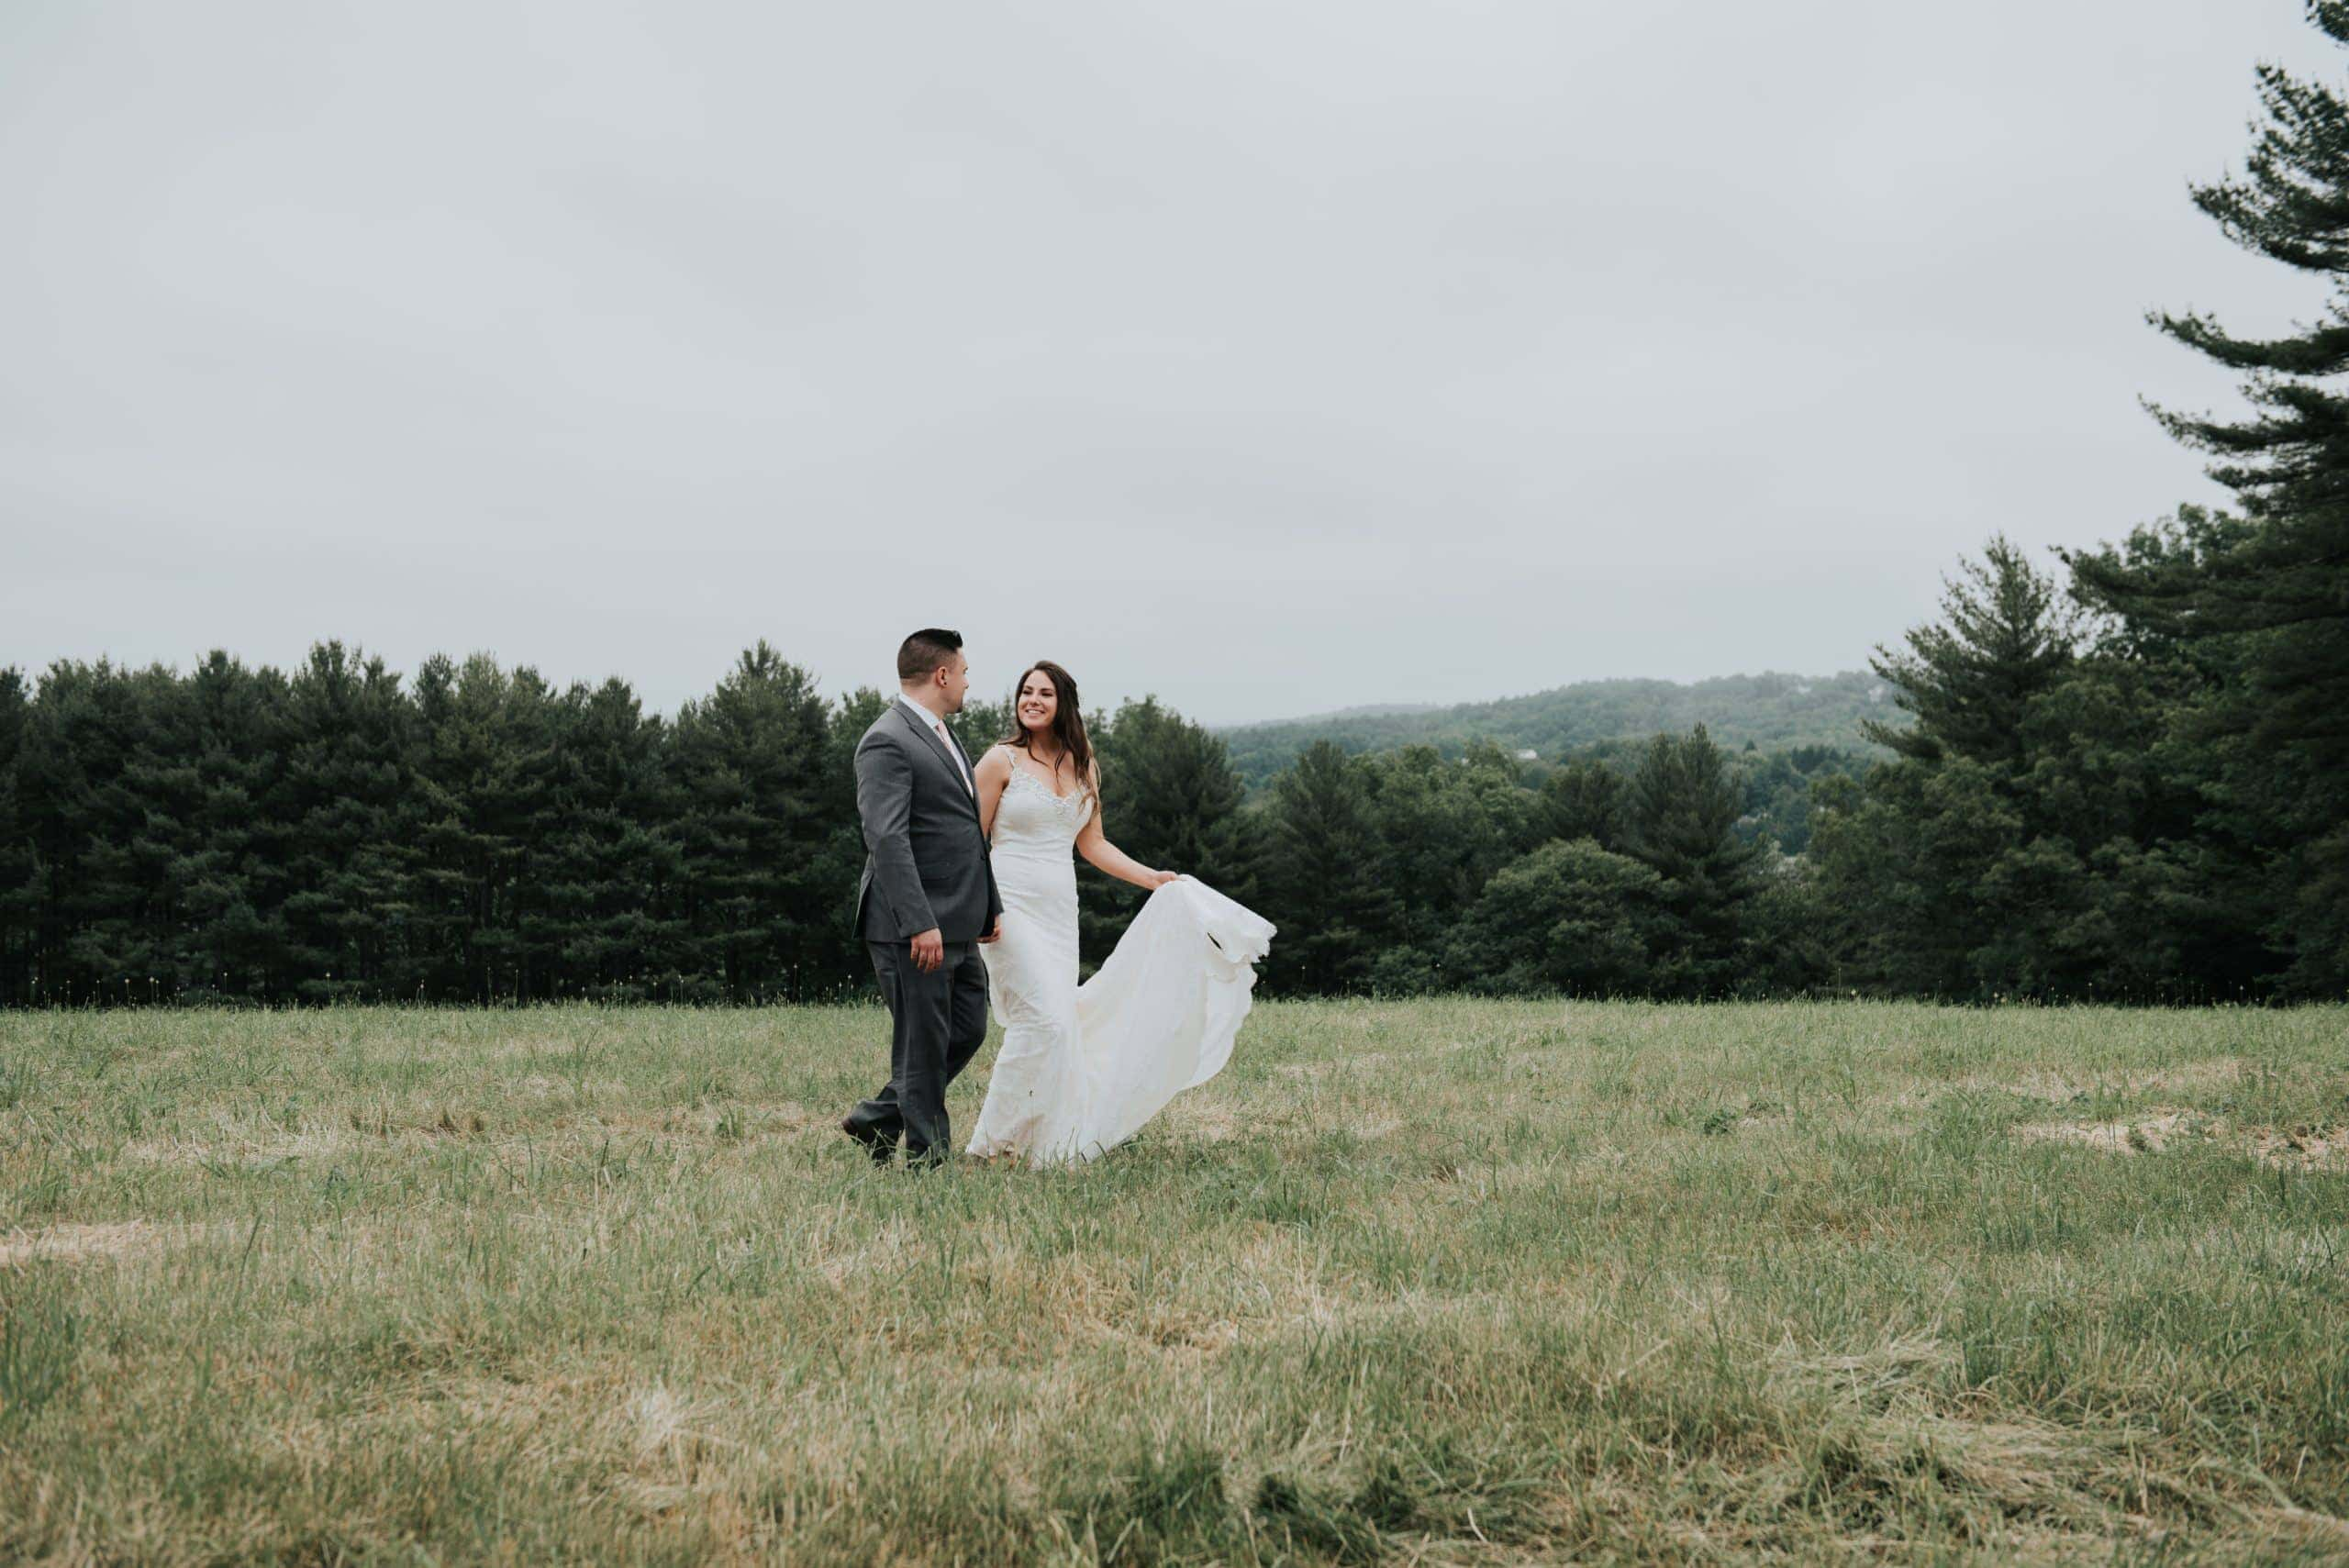 boho bride and groom walking in forest Zika's Hilltop Barn Wedding Spencer Massachusetts